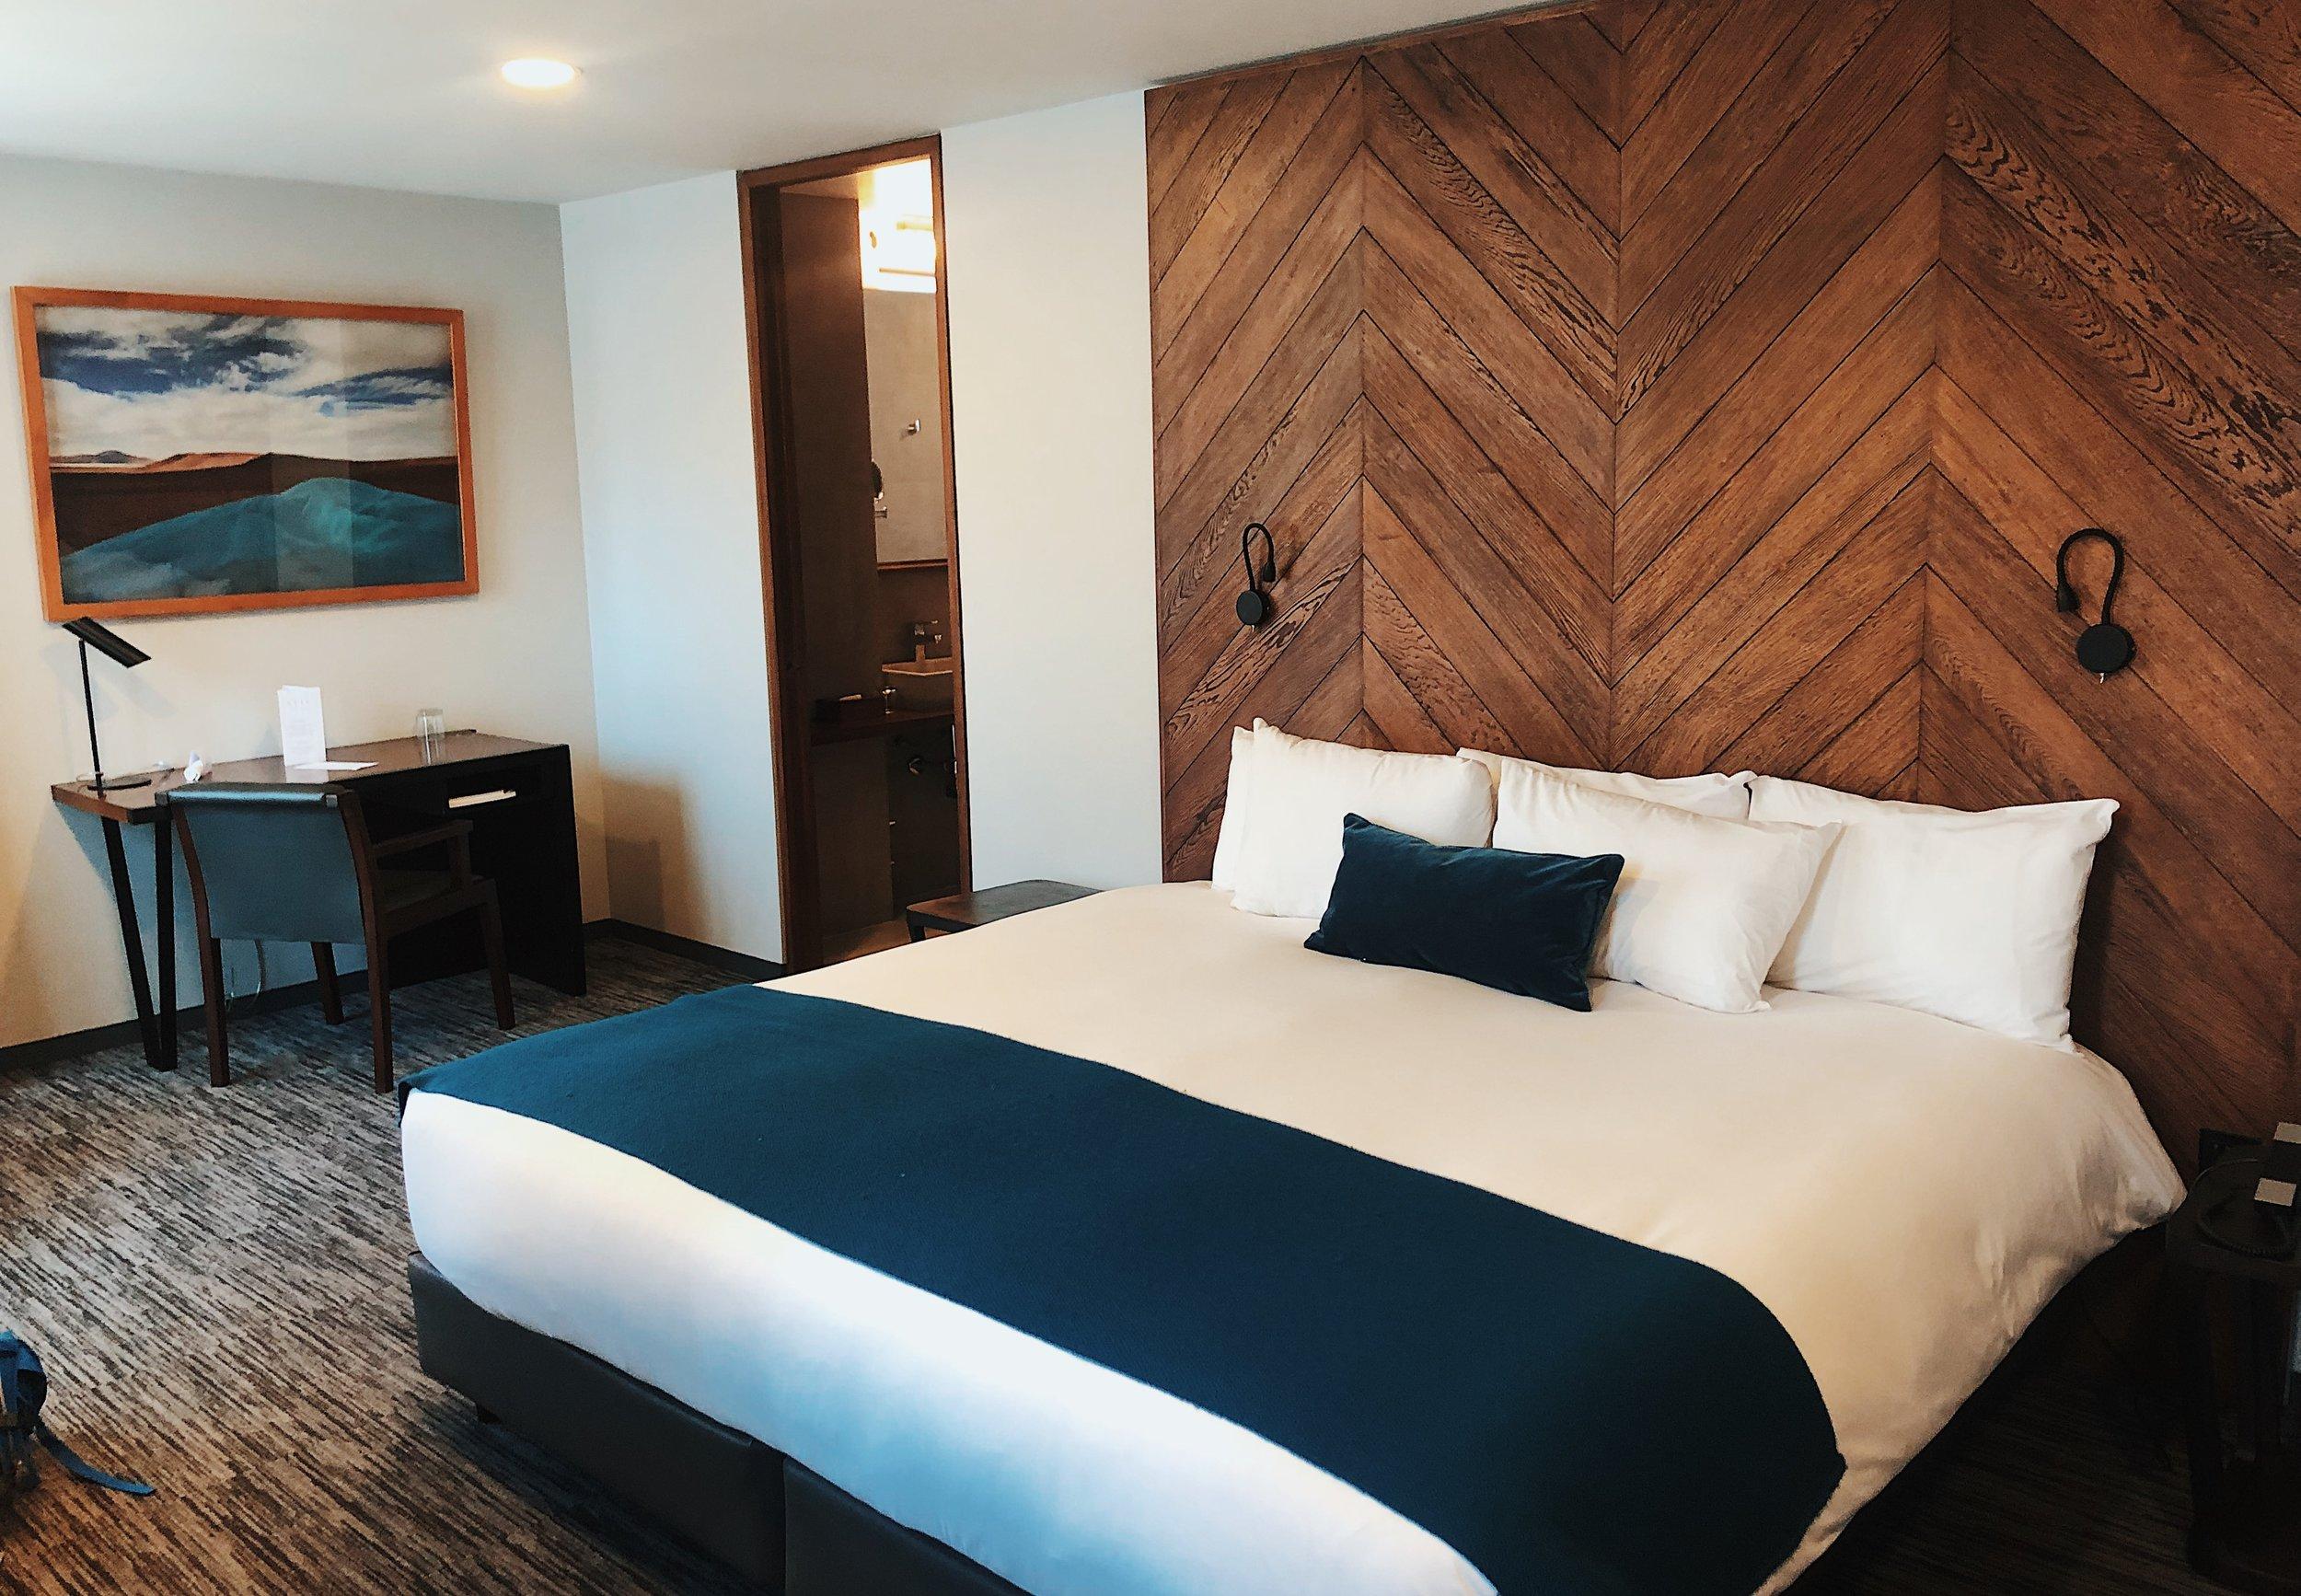 Atix Hotel room